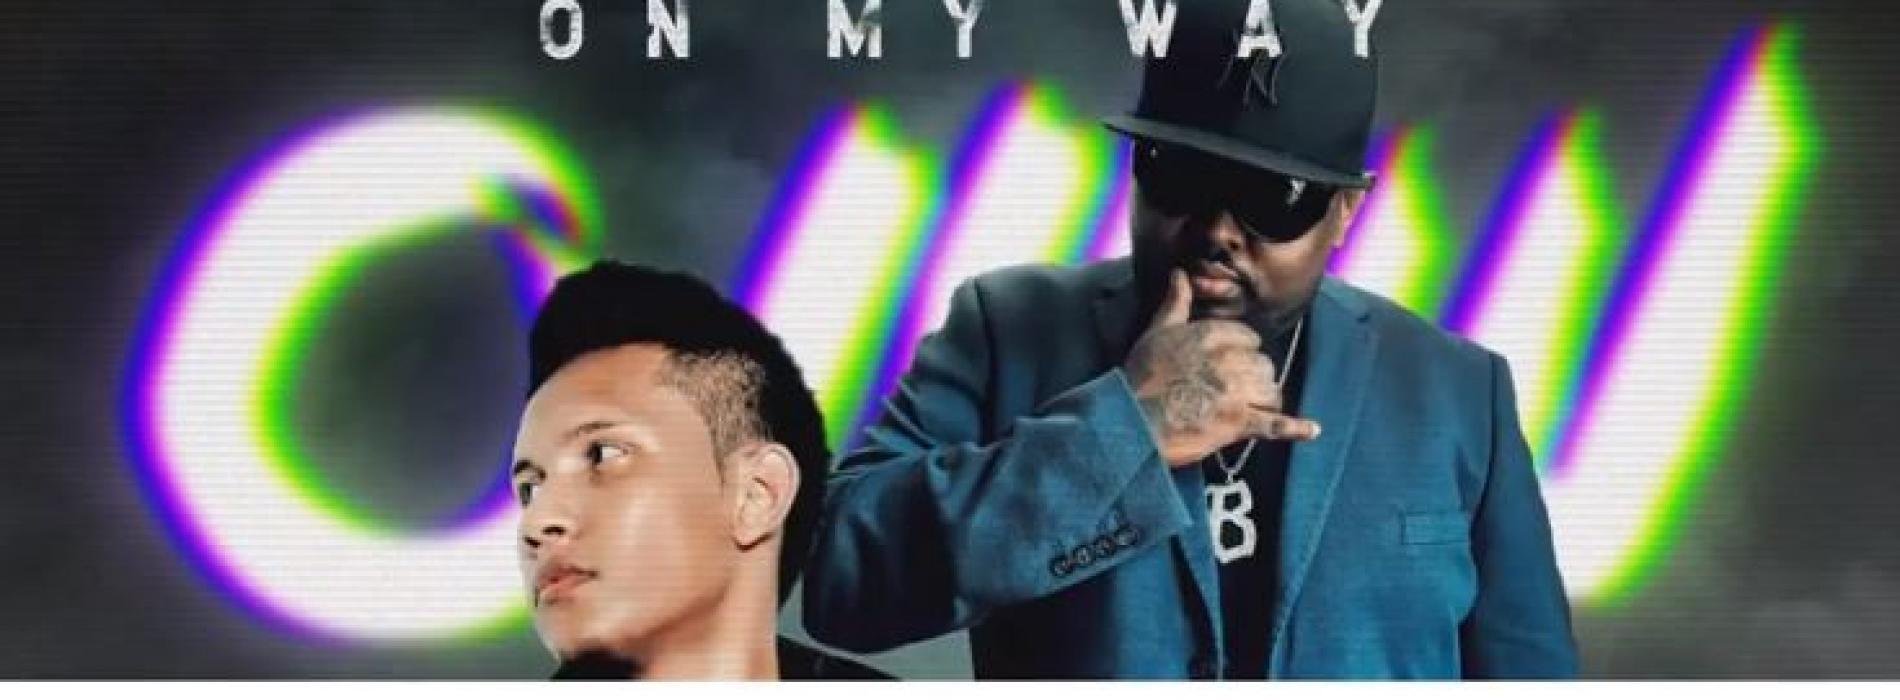 ON MY WAY – Azim Ousman Ft Bone Killa (Official Teaser Trailer)